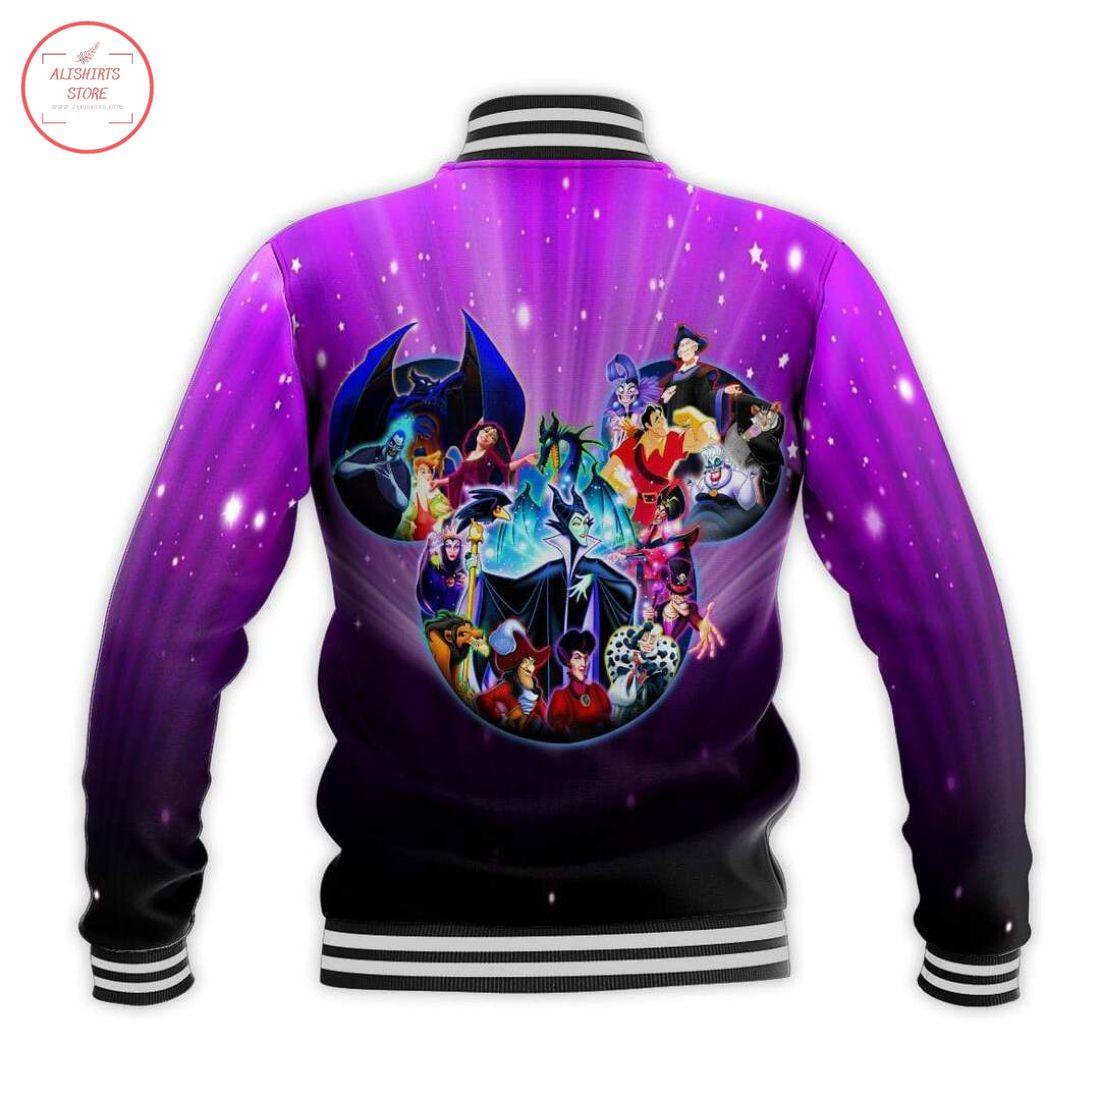 Disney Fantasia Villains Letterman Jacket